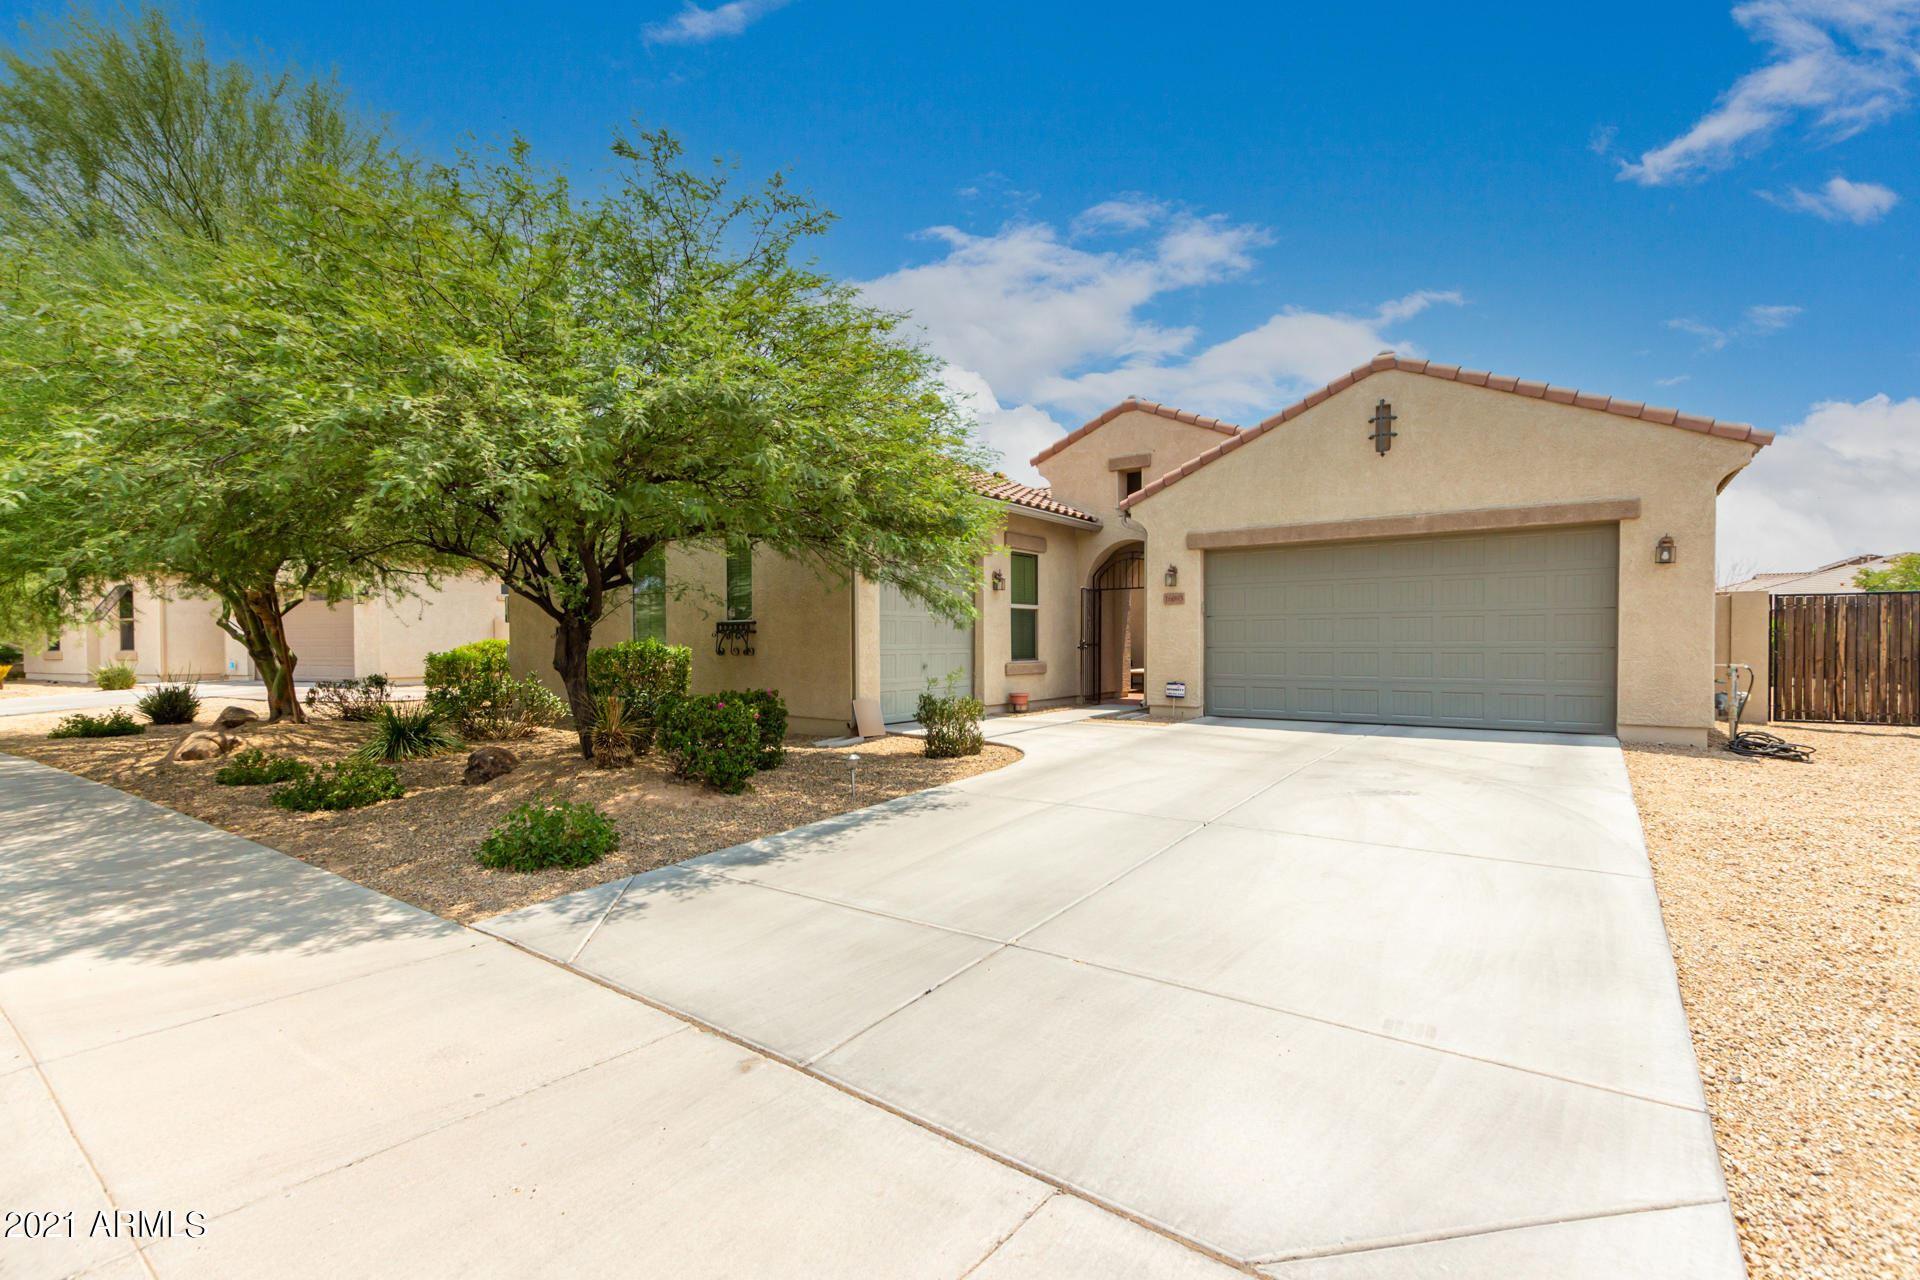 16093 W CORONADO Road W, Goodyear, AZ 85395 - MLS#: 6264159